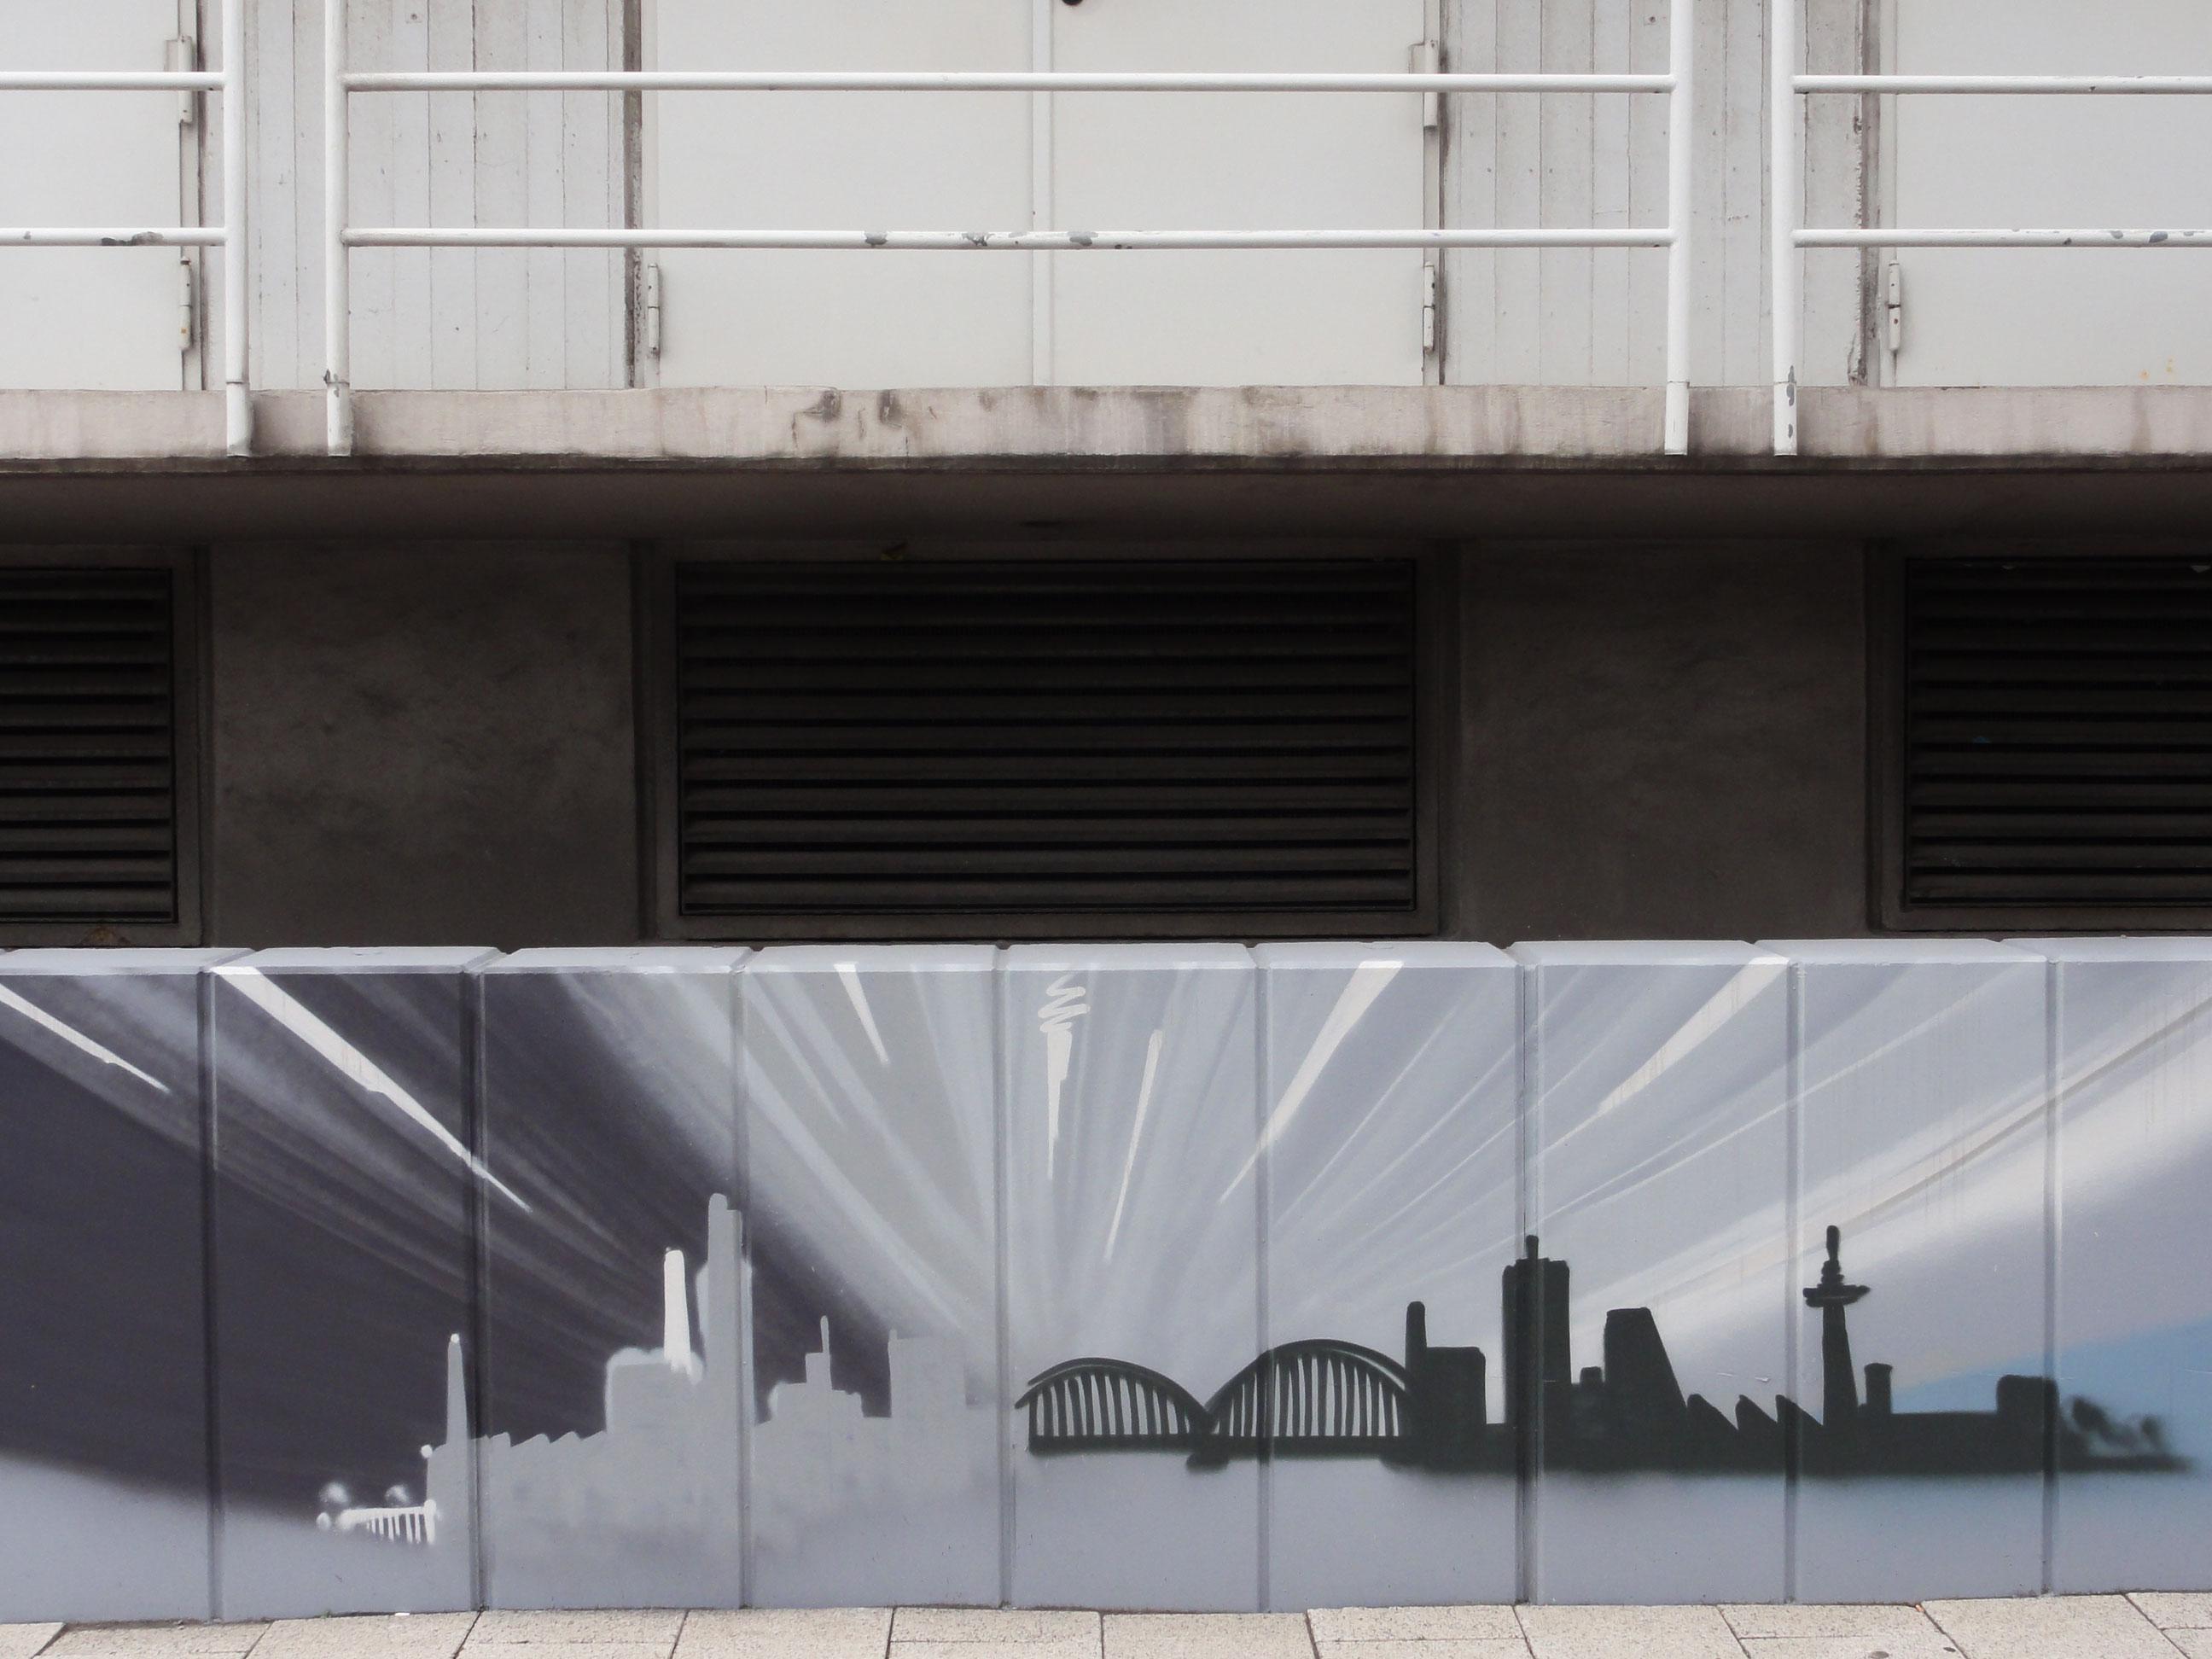 Graffiti vom Bomber am Airport Frankfurt: Skyline